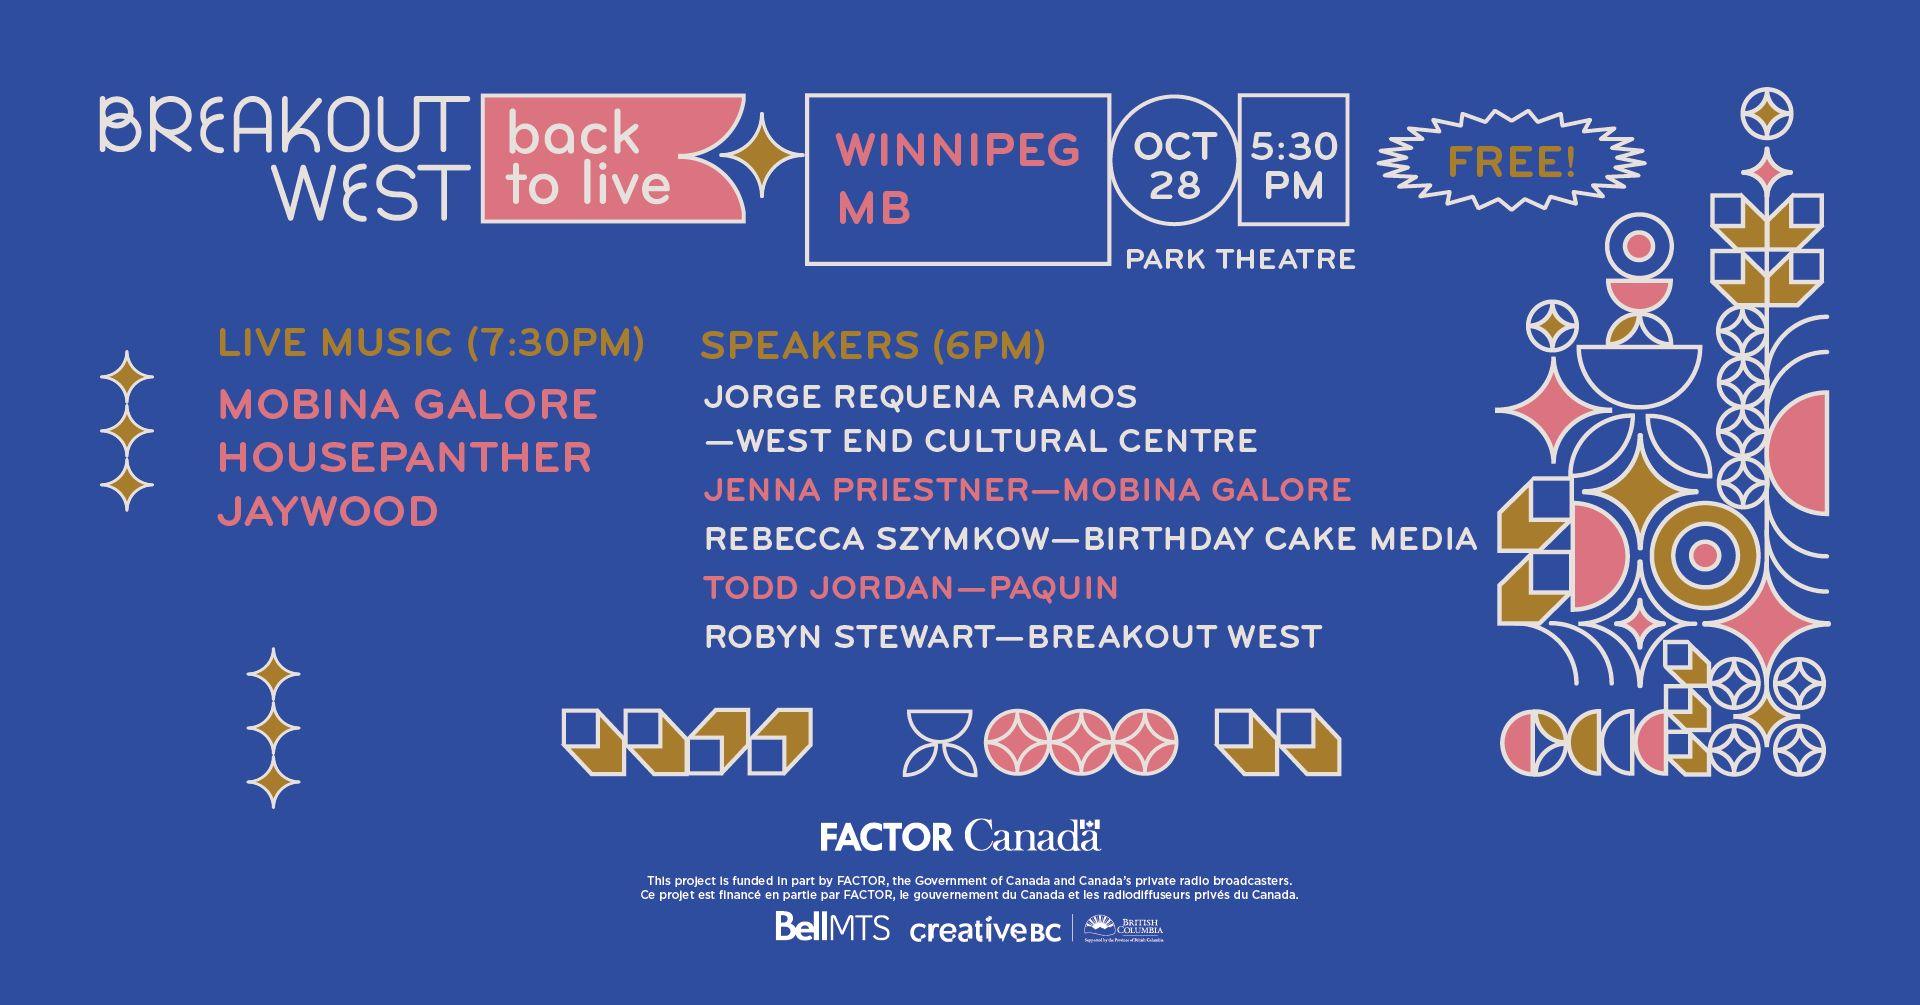 Back to Live - Winnipeg